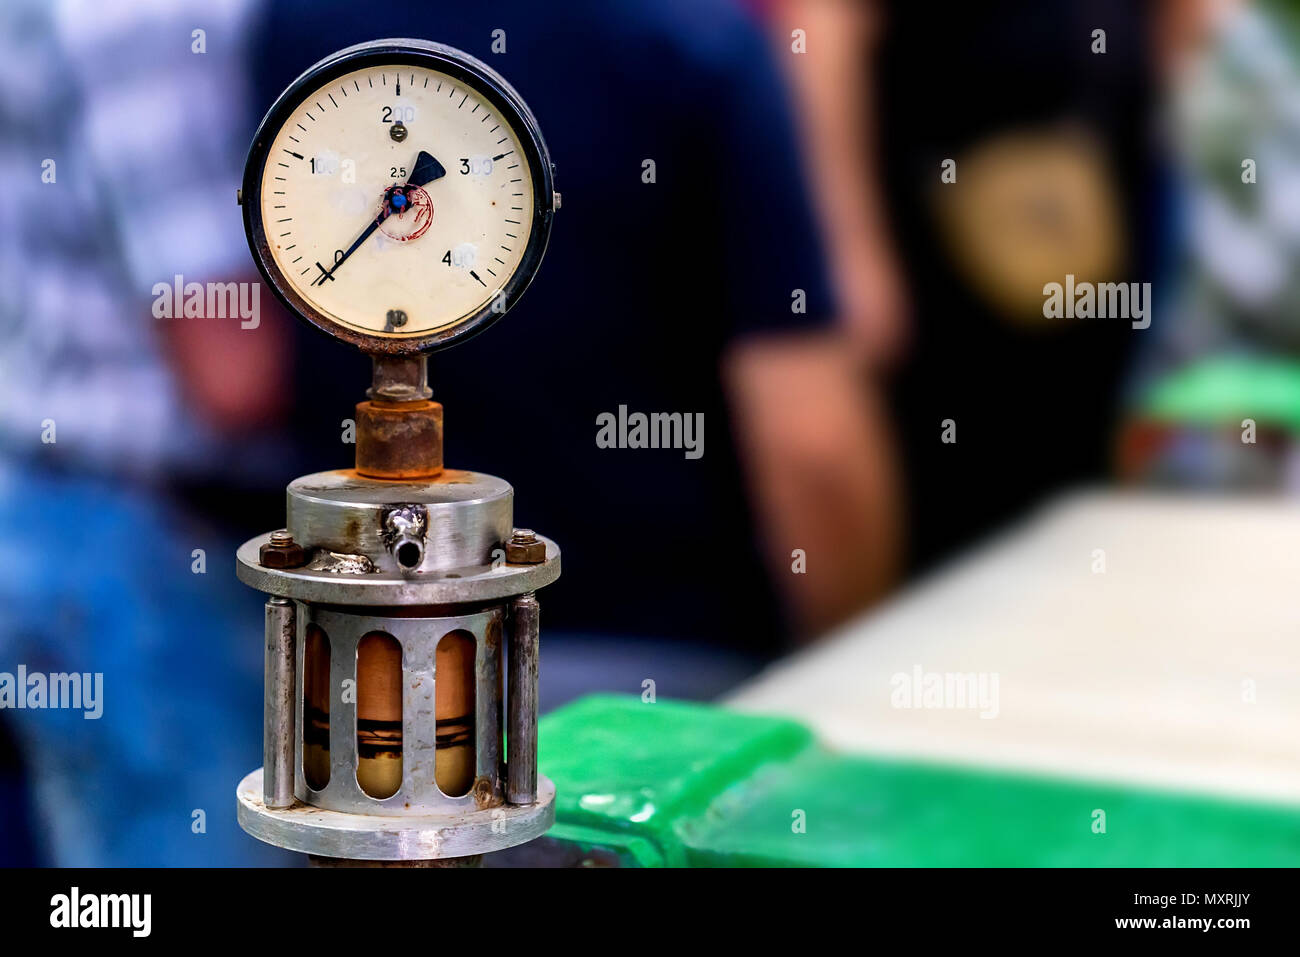 Close up of manometer or pressure gauge at winery - Stock Image